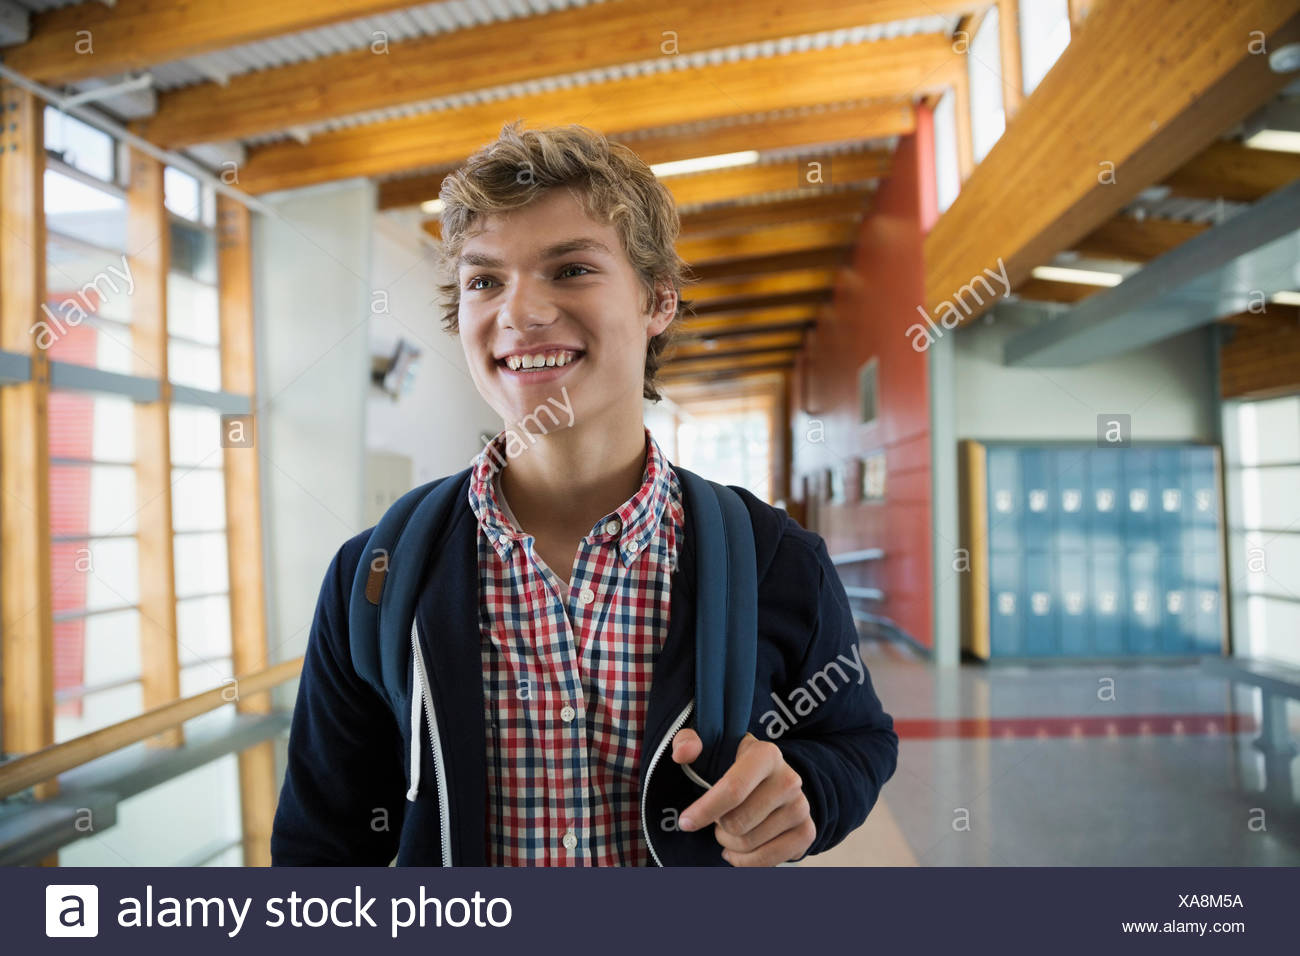 Smiling high school student in corridor - Stock Image